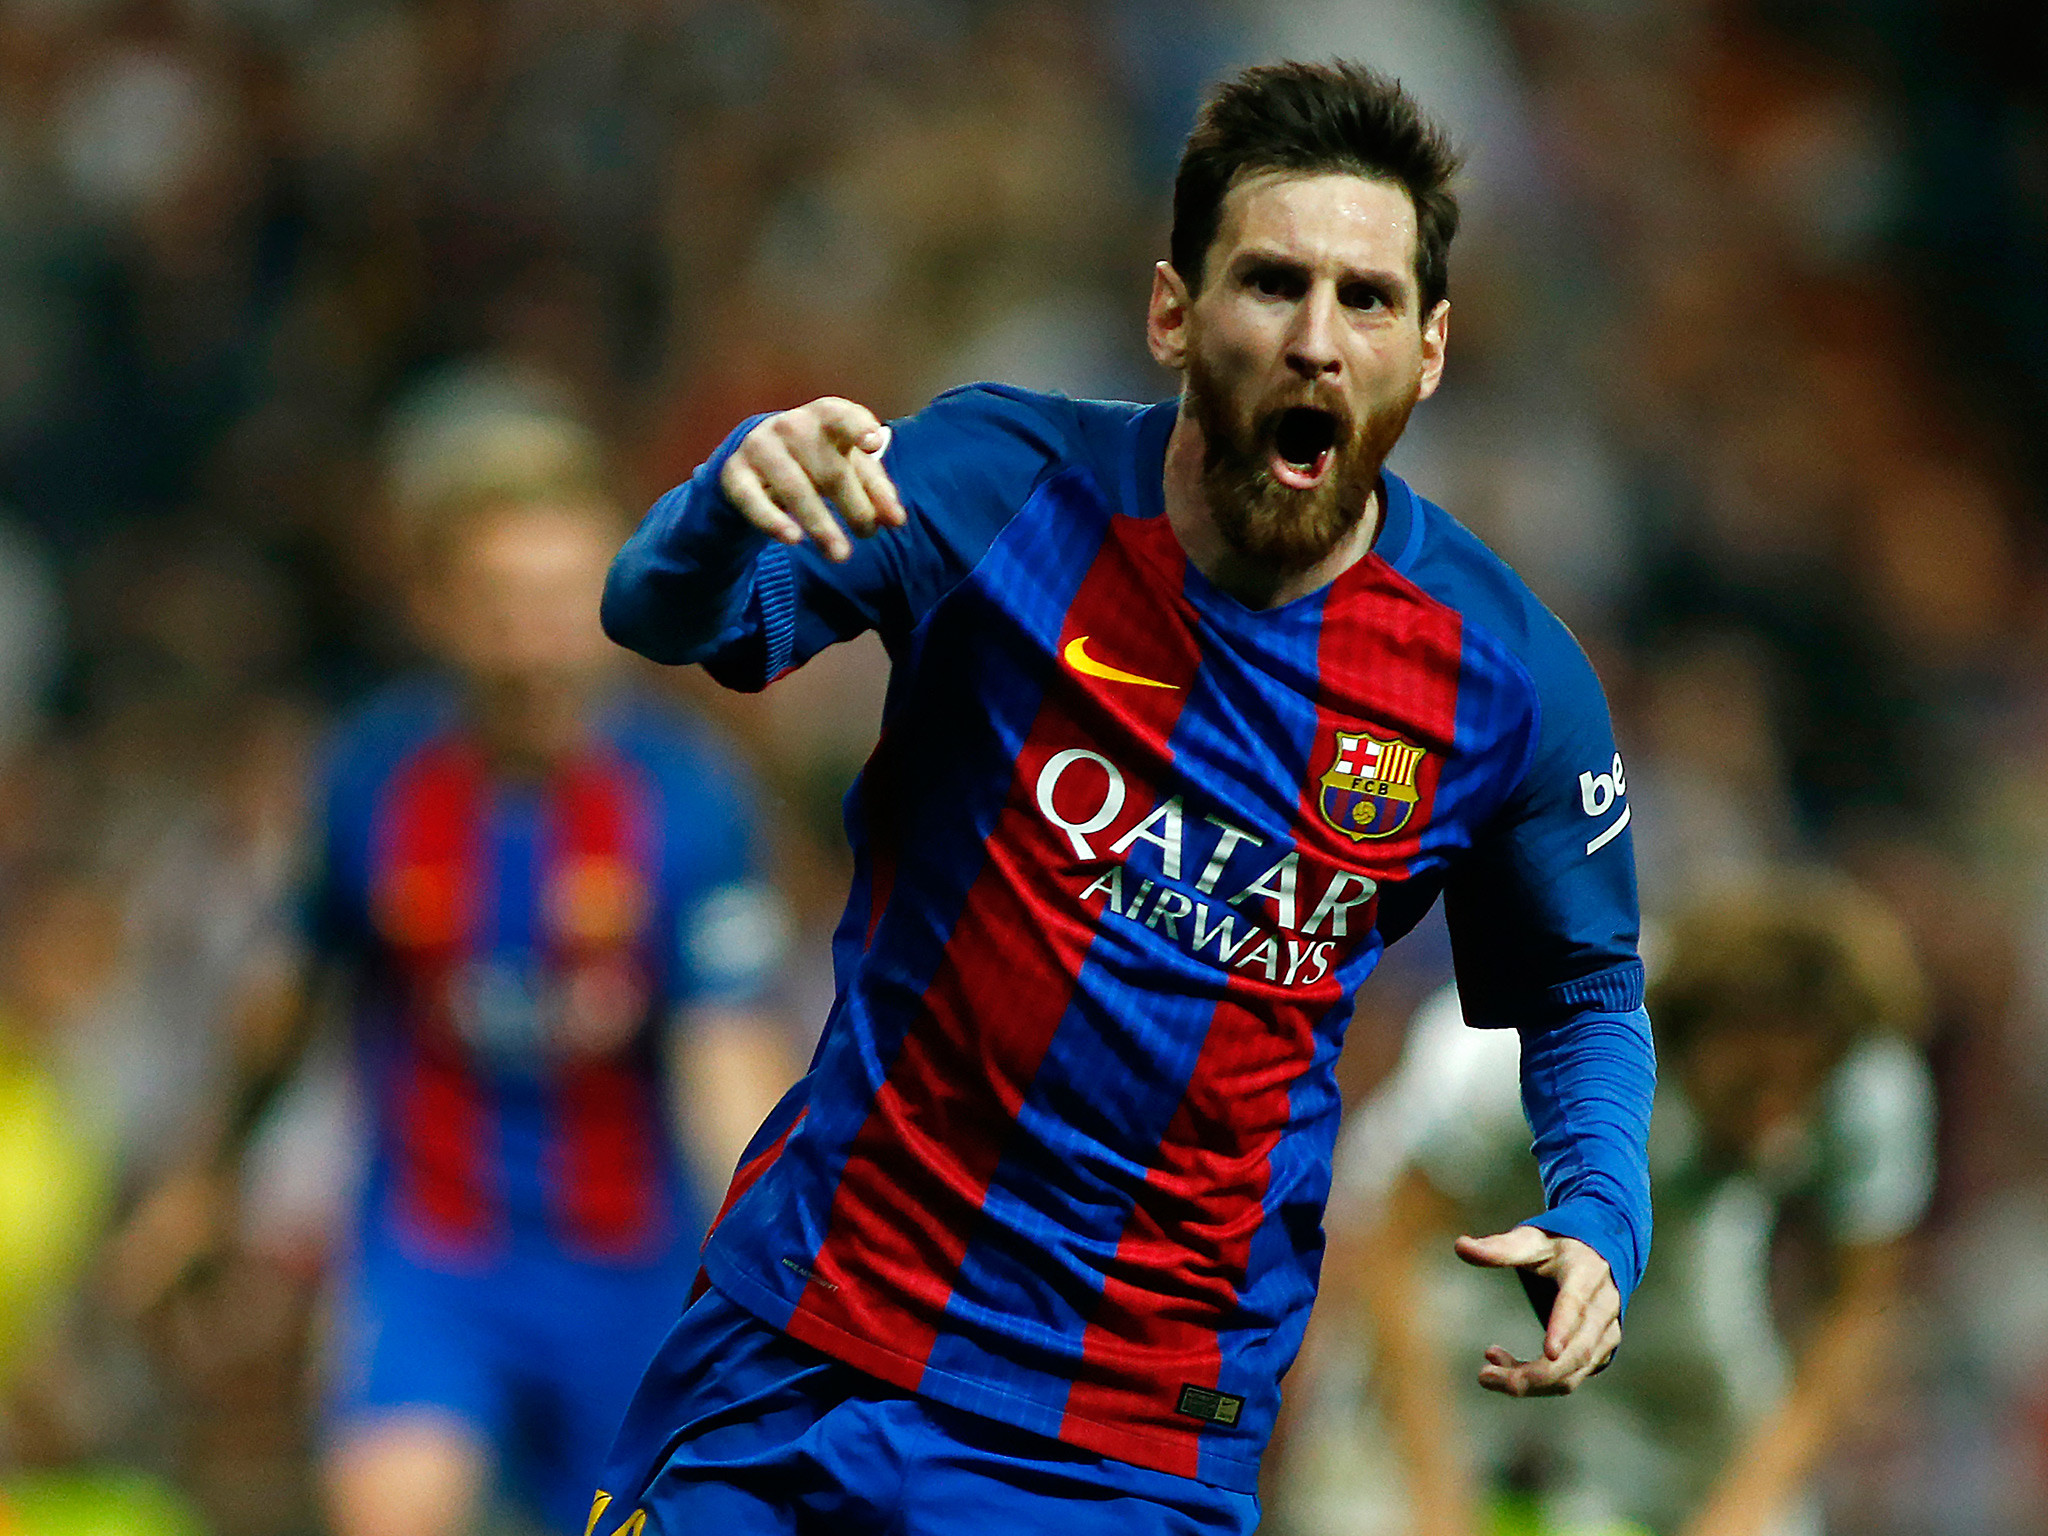 Ronaldo vs Messi Wallpaper 2018 77 images 2048x1536